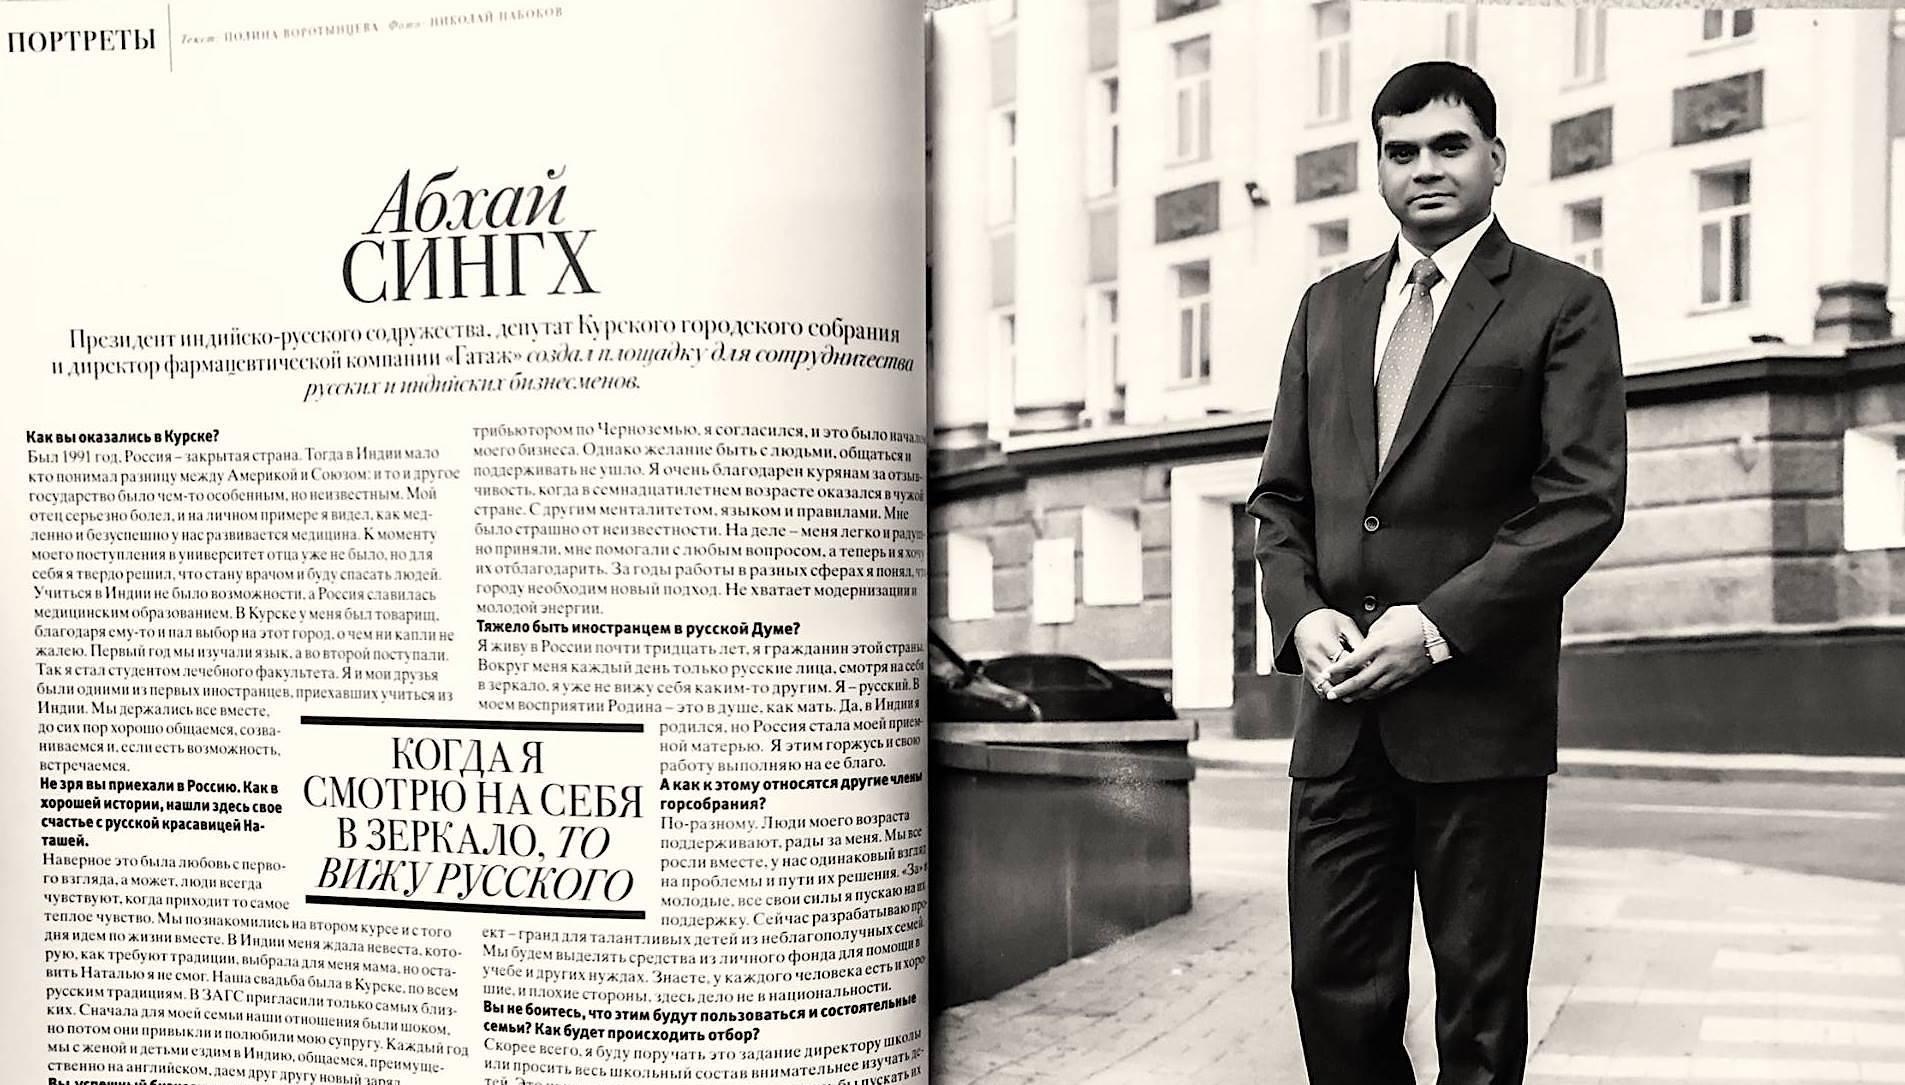 Meet this Bihari, who is a Member of Legislative Assembly in the parliament of Vladimir Putin.